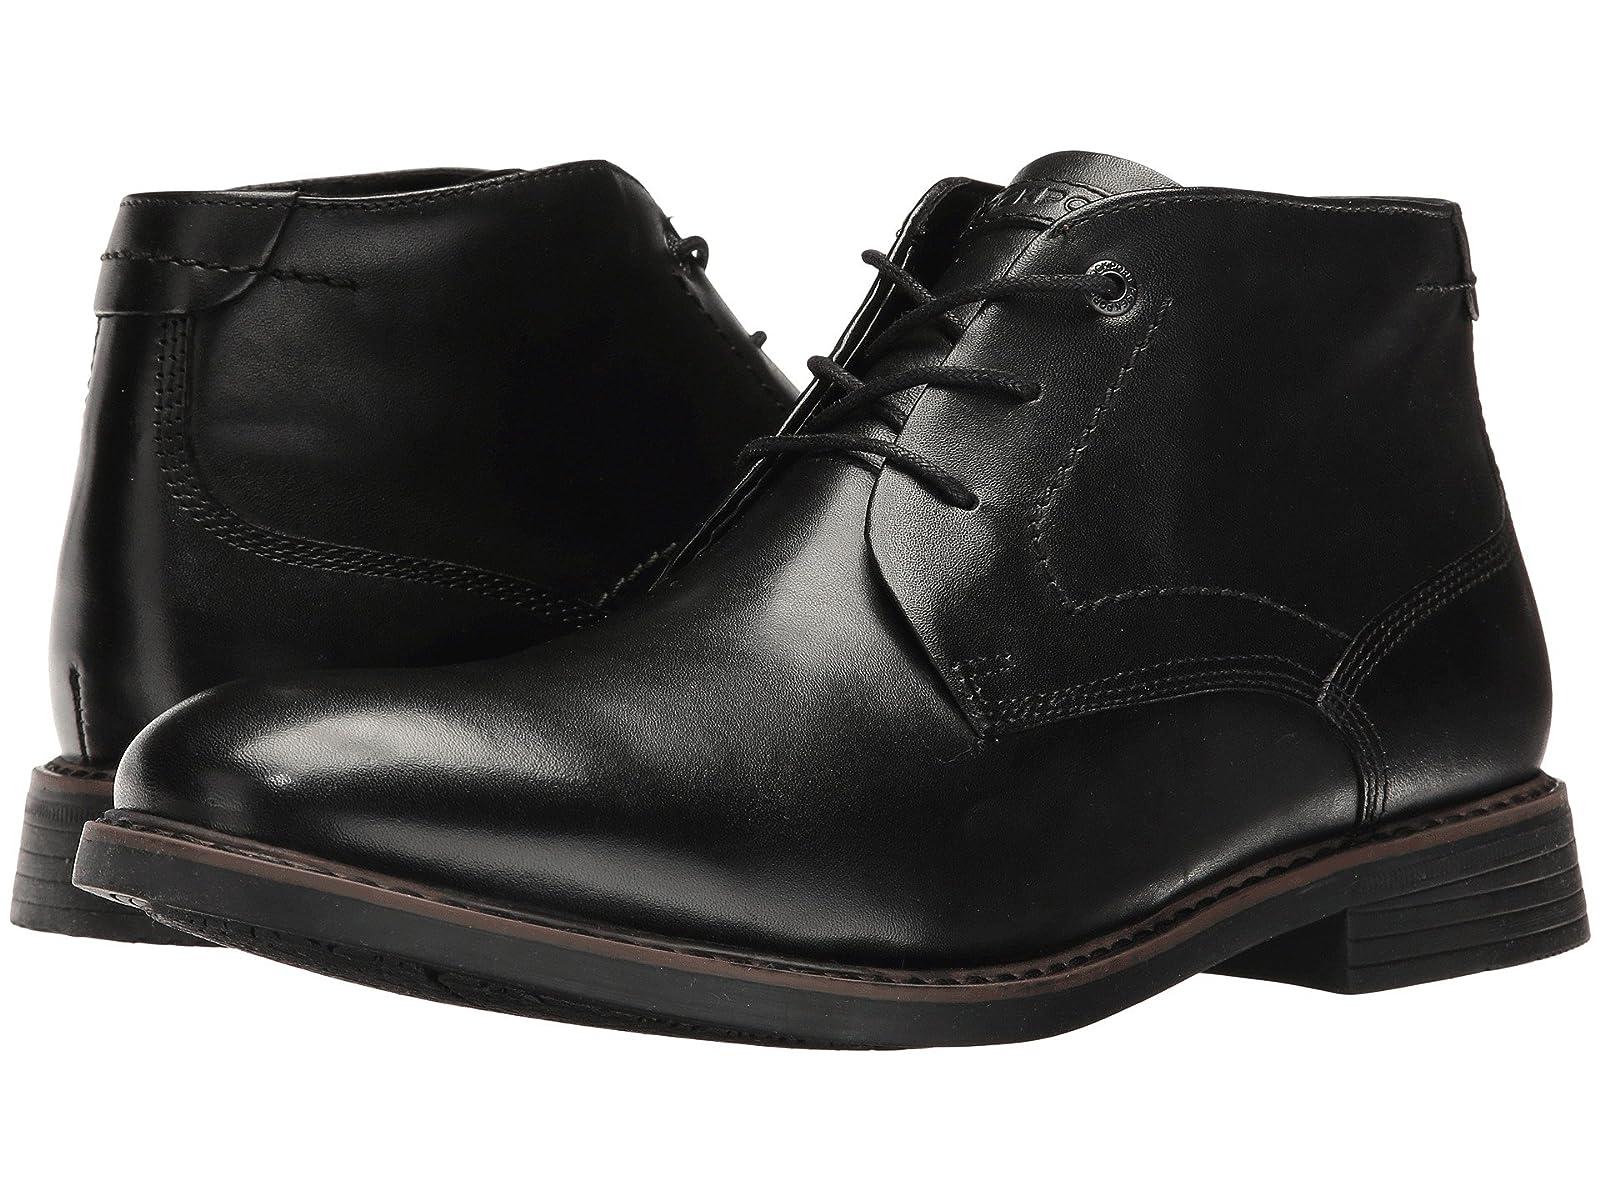 Rockport Classic Break ChukkaCheap and distinctive eye-catching shoes